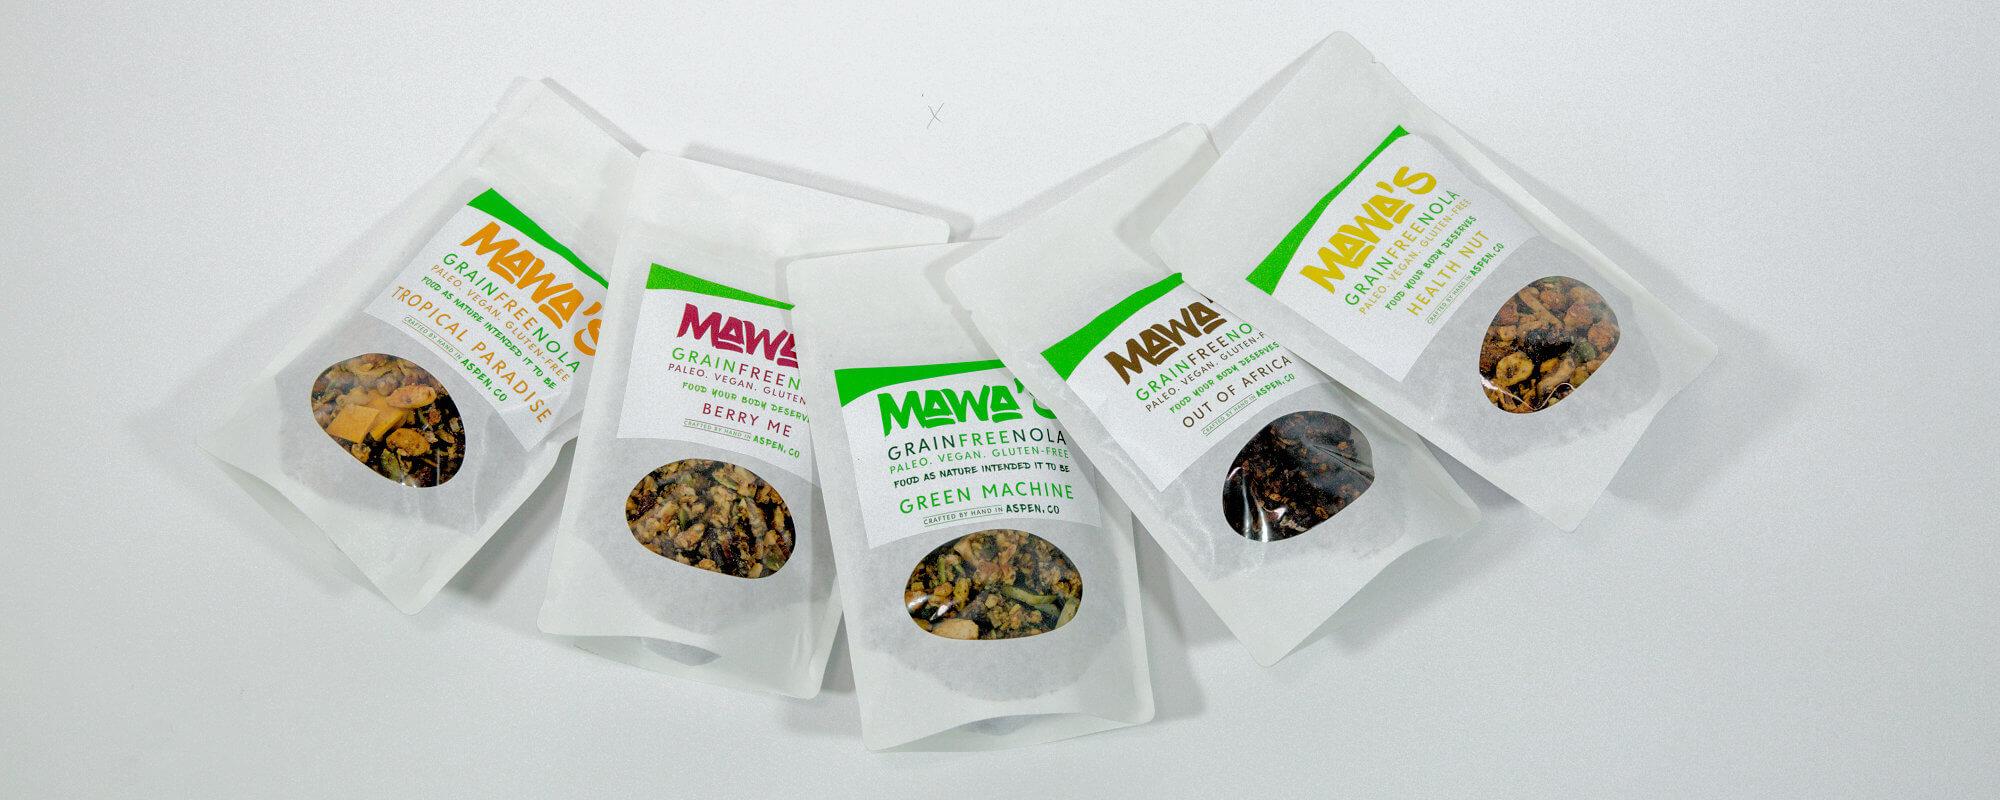 GrainFreeNola Sweeteners